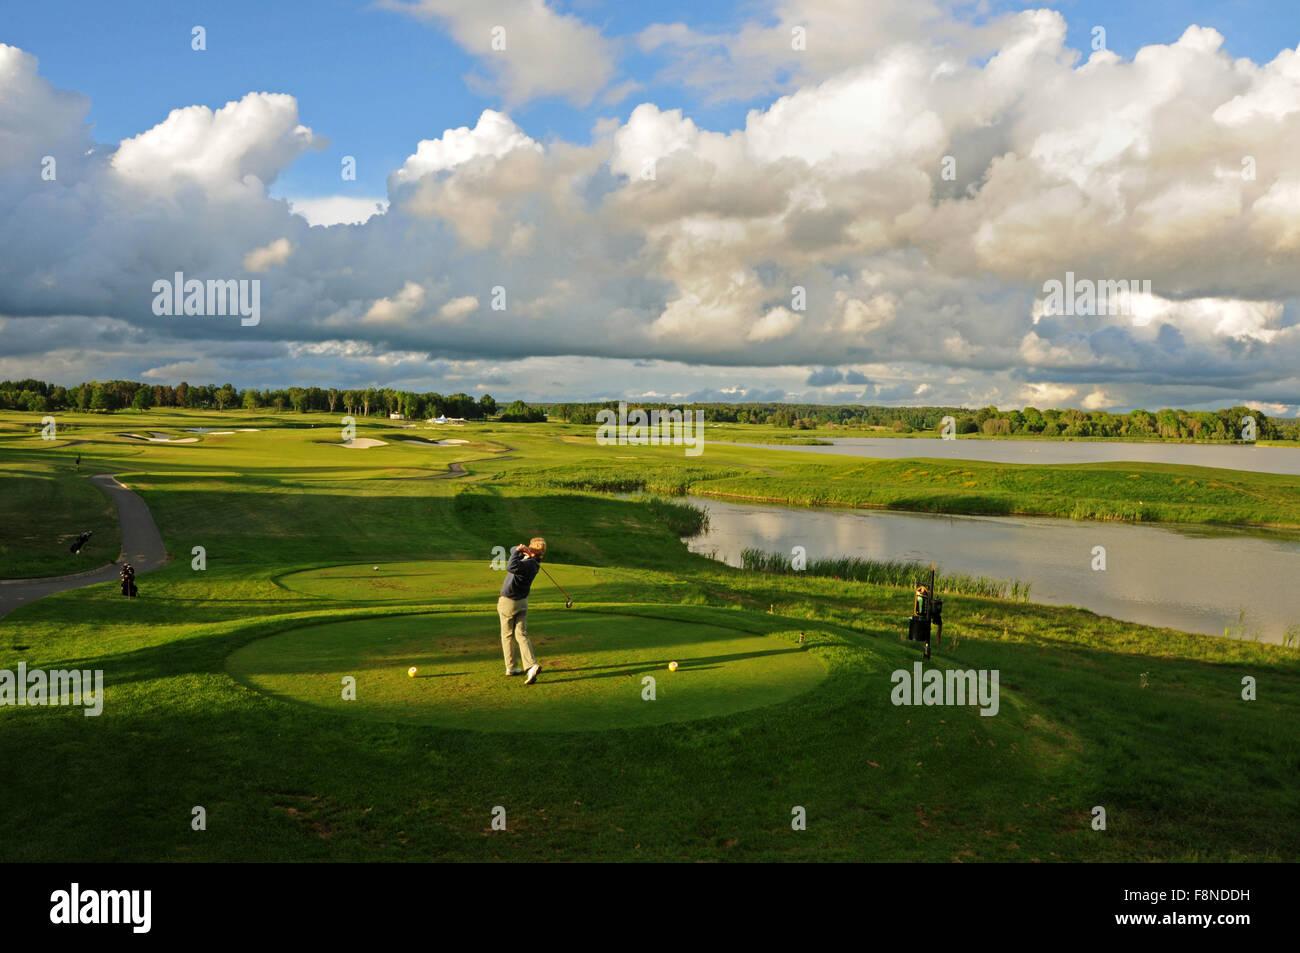 Sunset tee shot on Stadium Course at Bro Hof Slott Golf Club, a golf course located in Upplands-Bro on Lake Mälaren - Stock Image